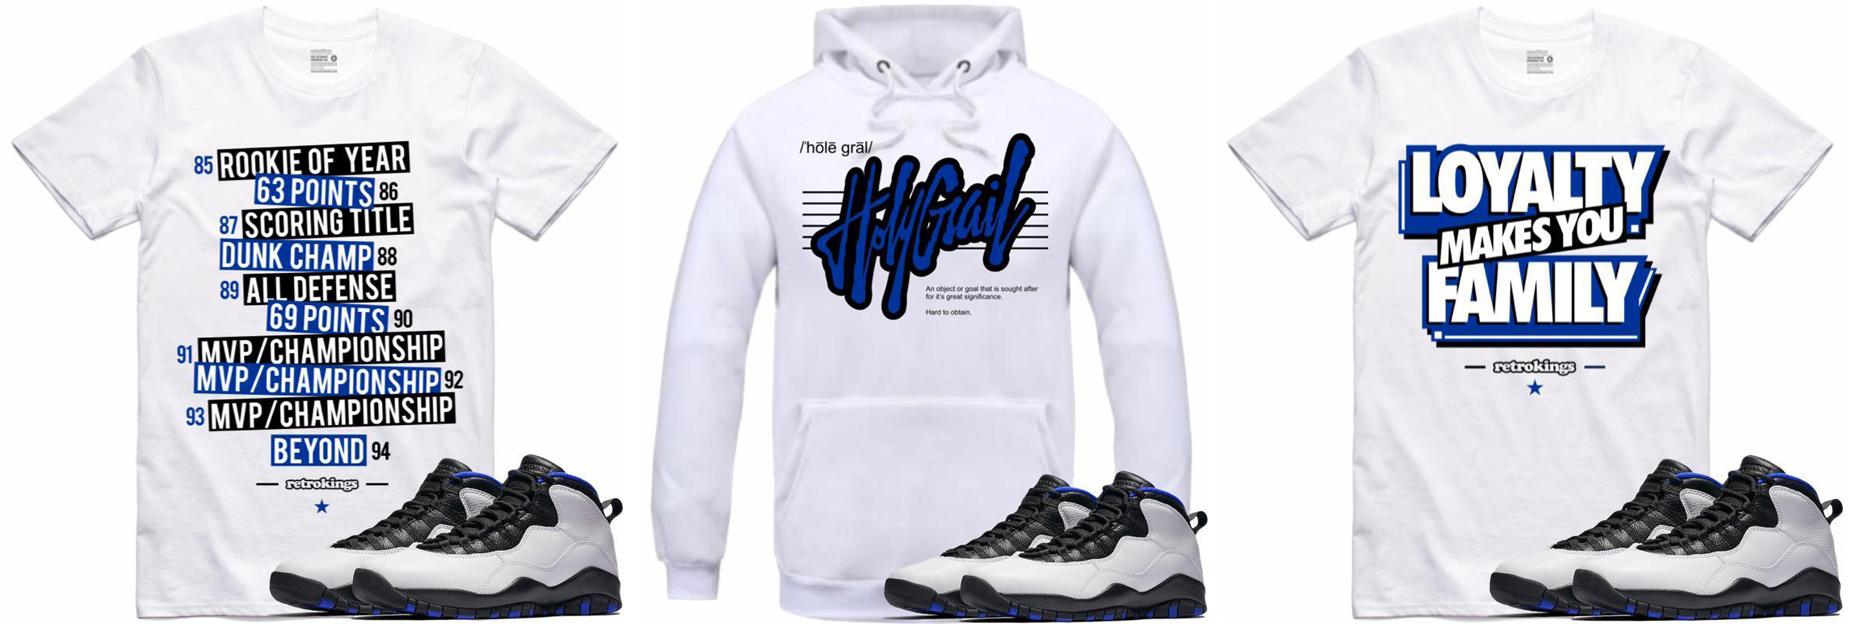 jordan-10-orlando-sneaker-shirts-hoodies